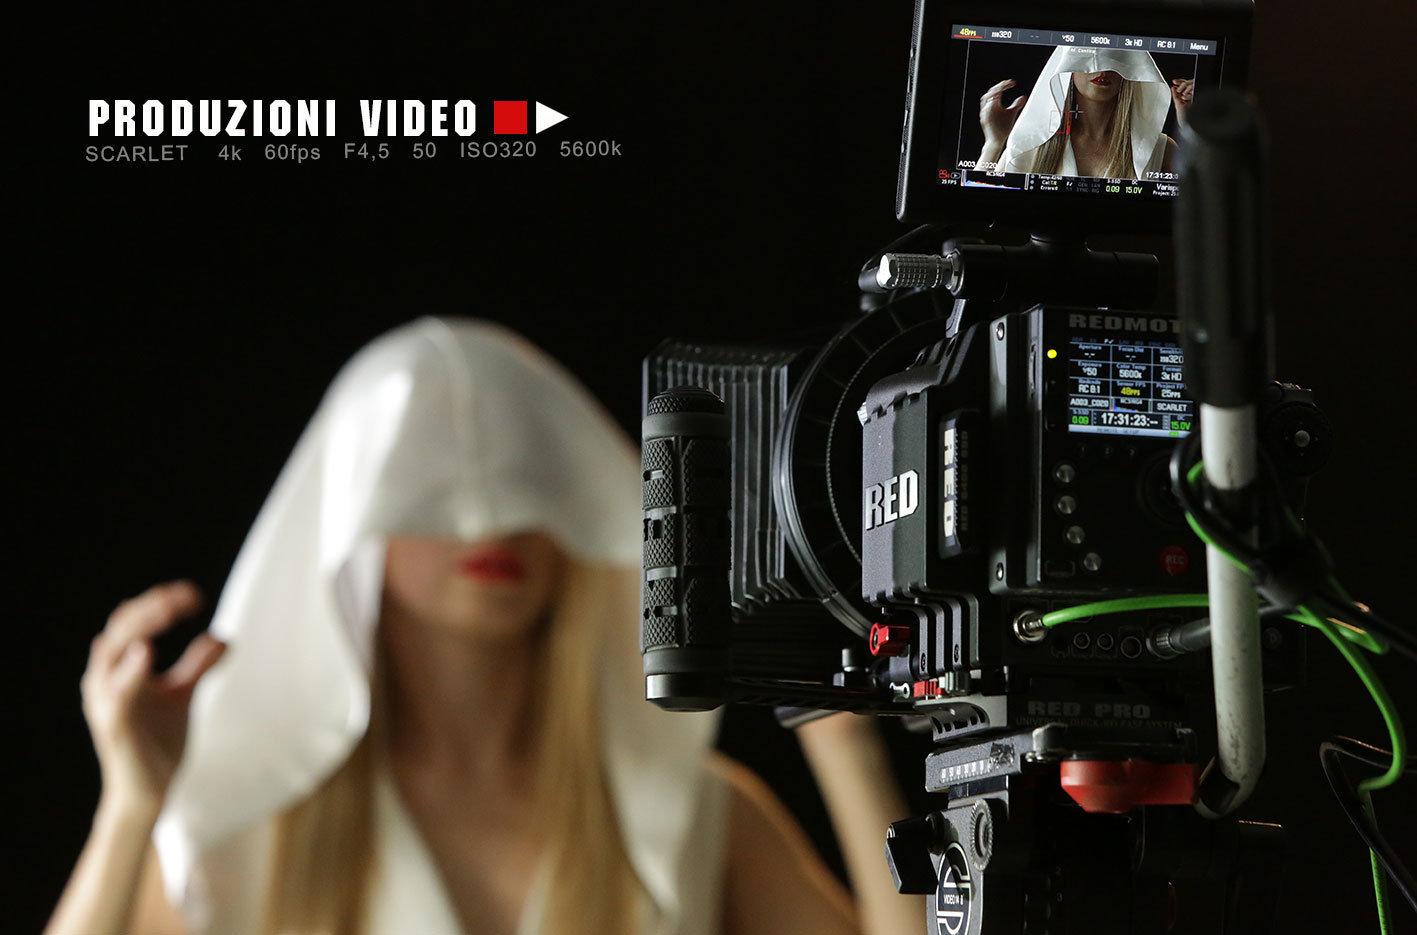 produzioni-video.jpg